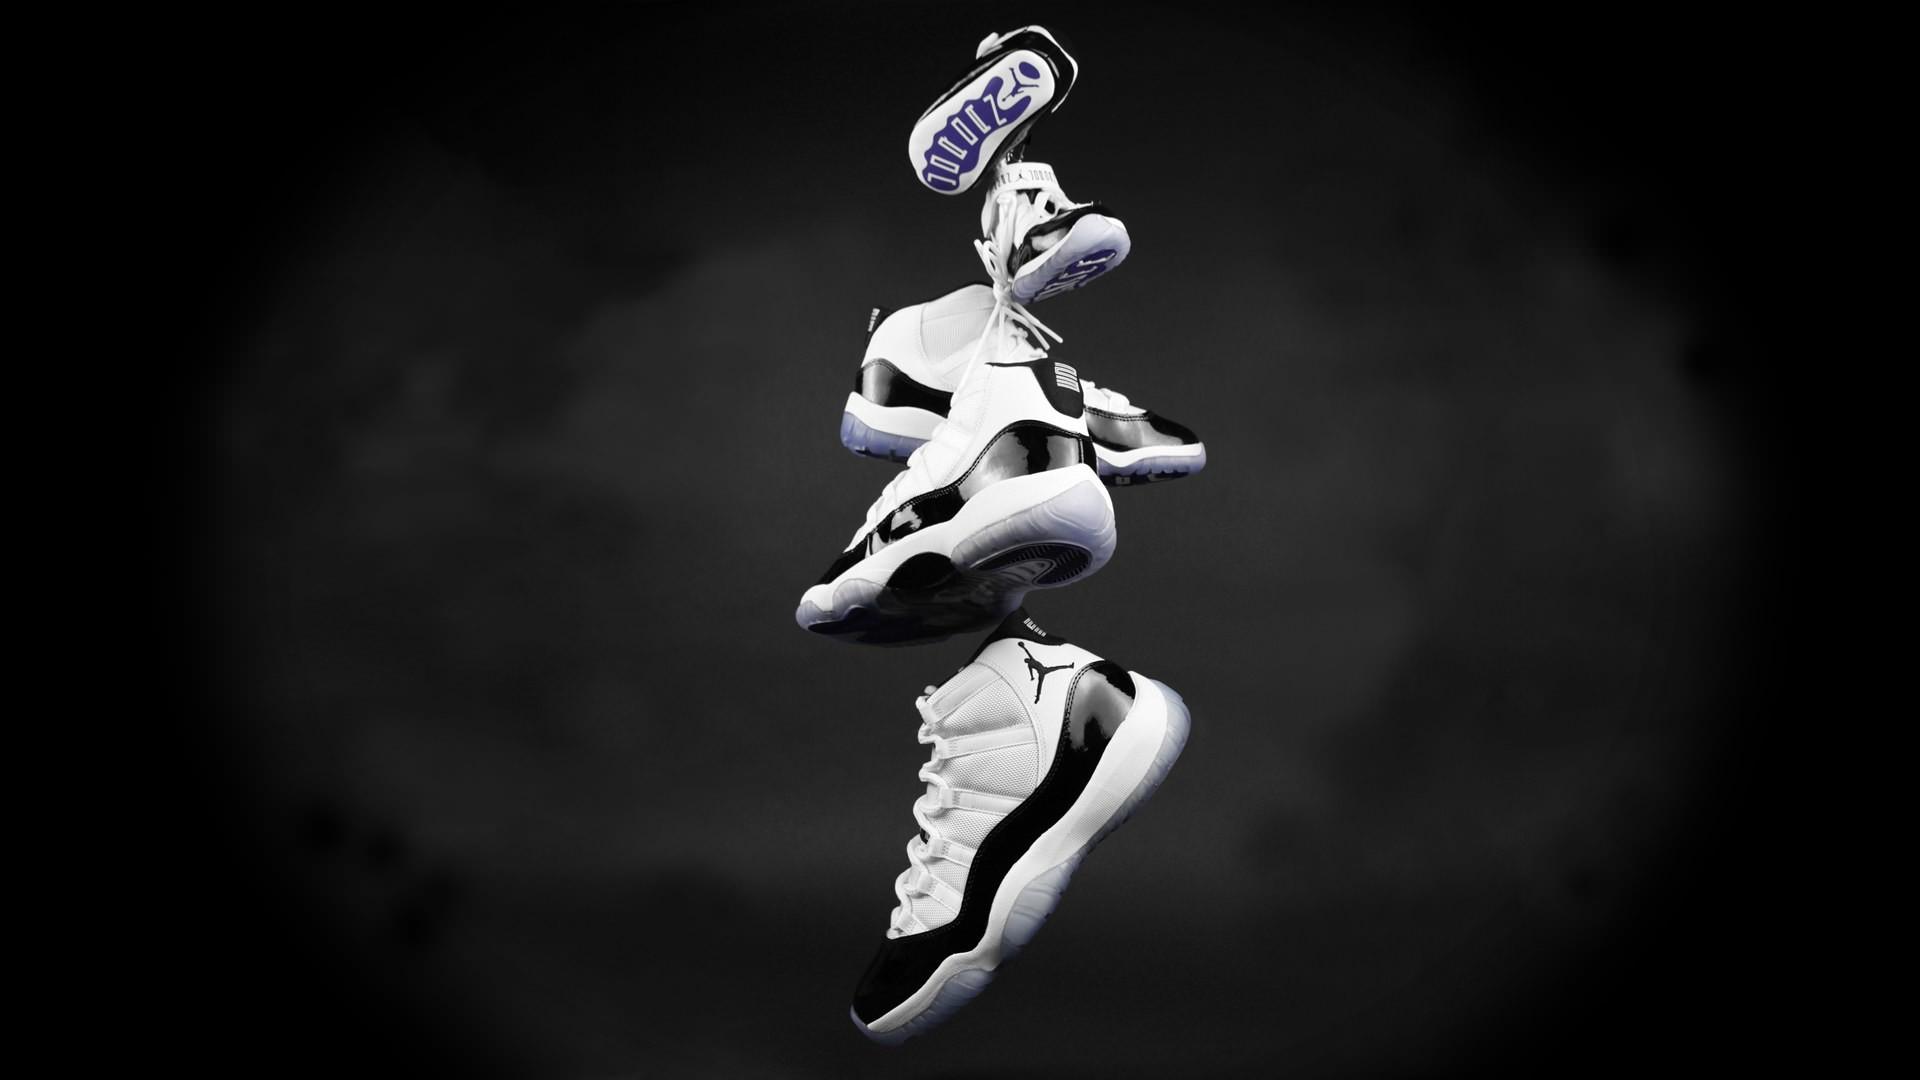 3840x2160 Black And White Michael Jordan 4k Wallpapers